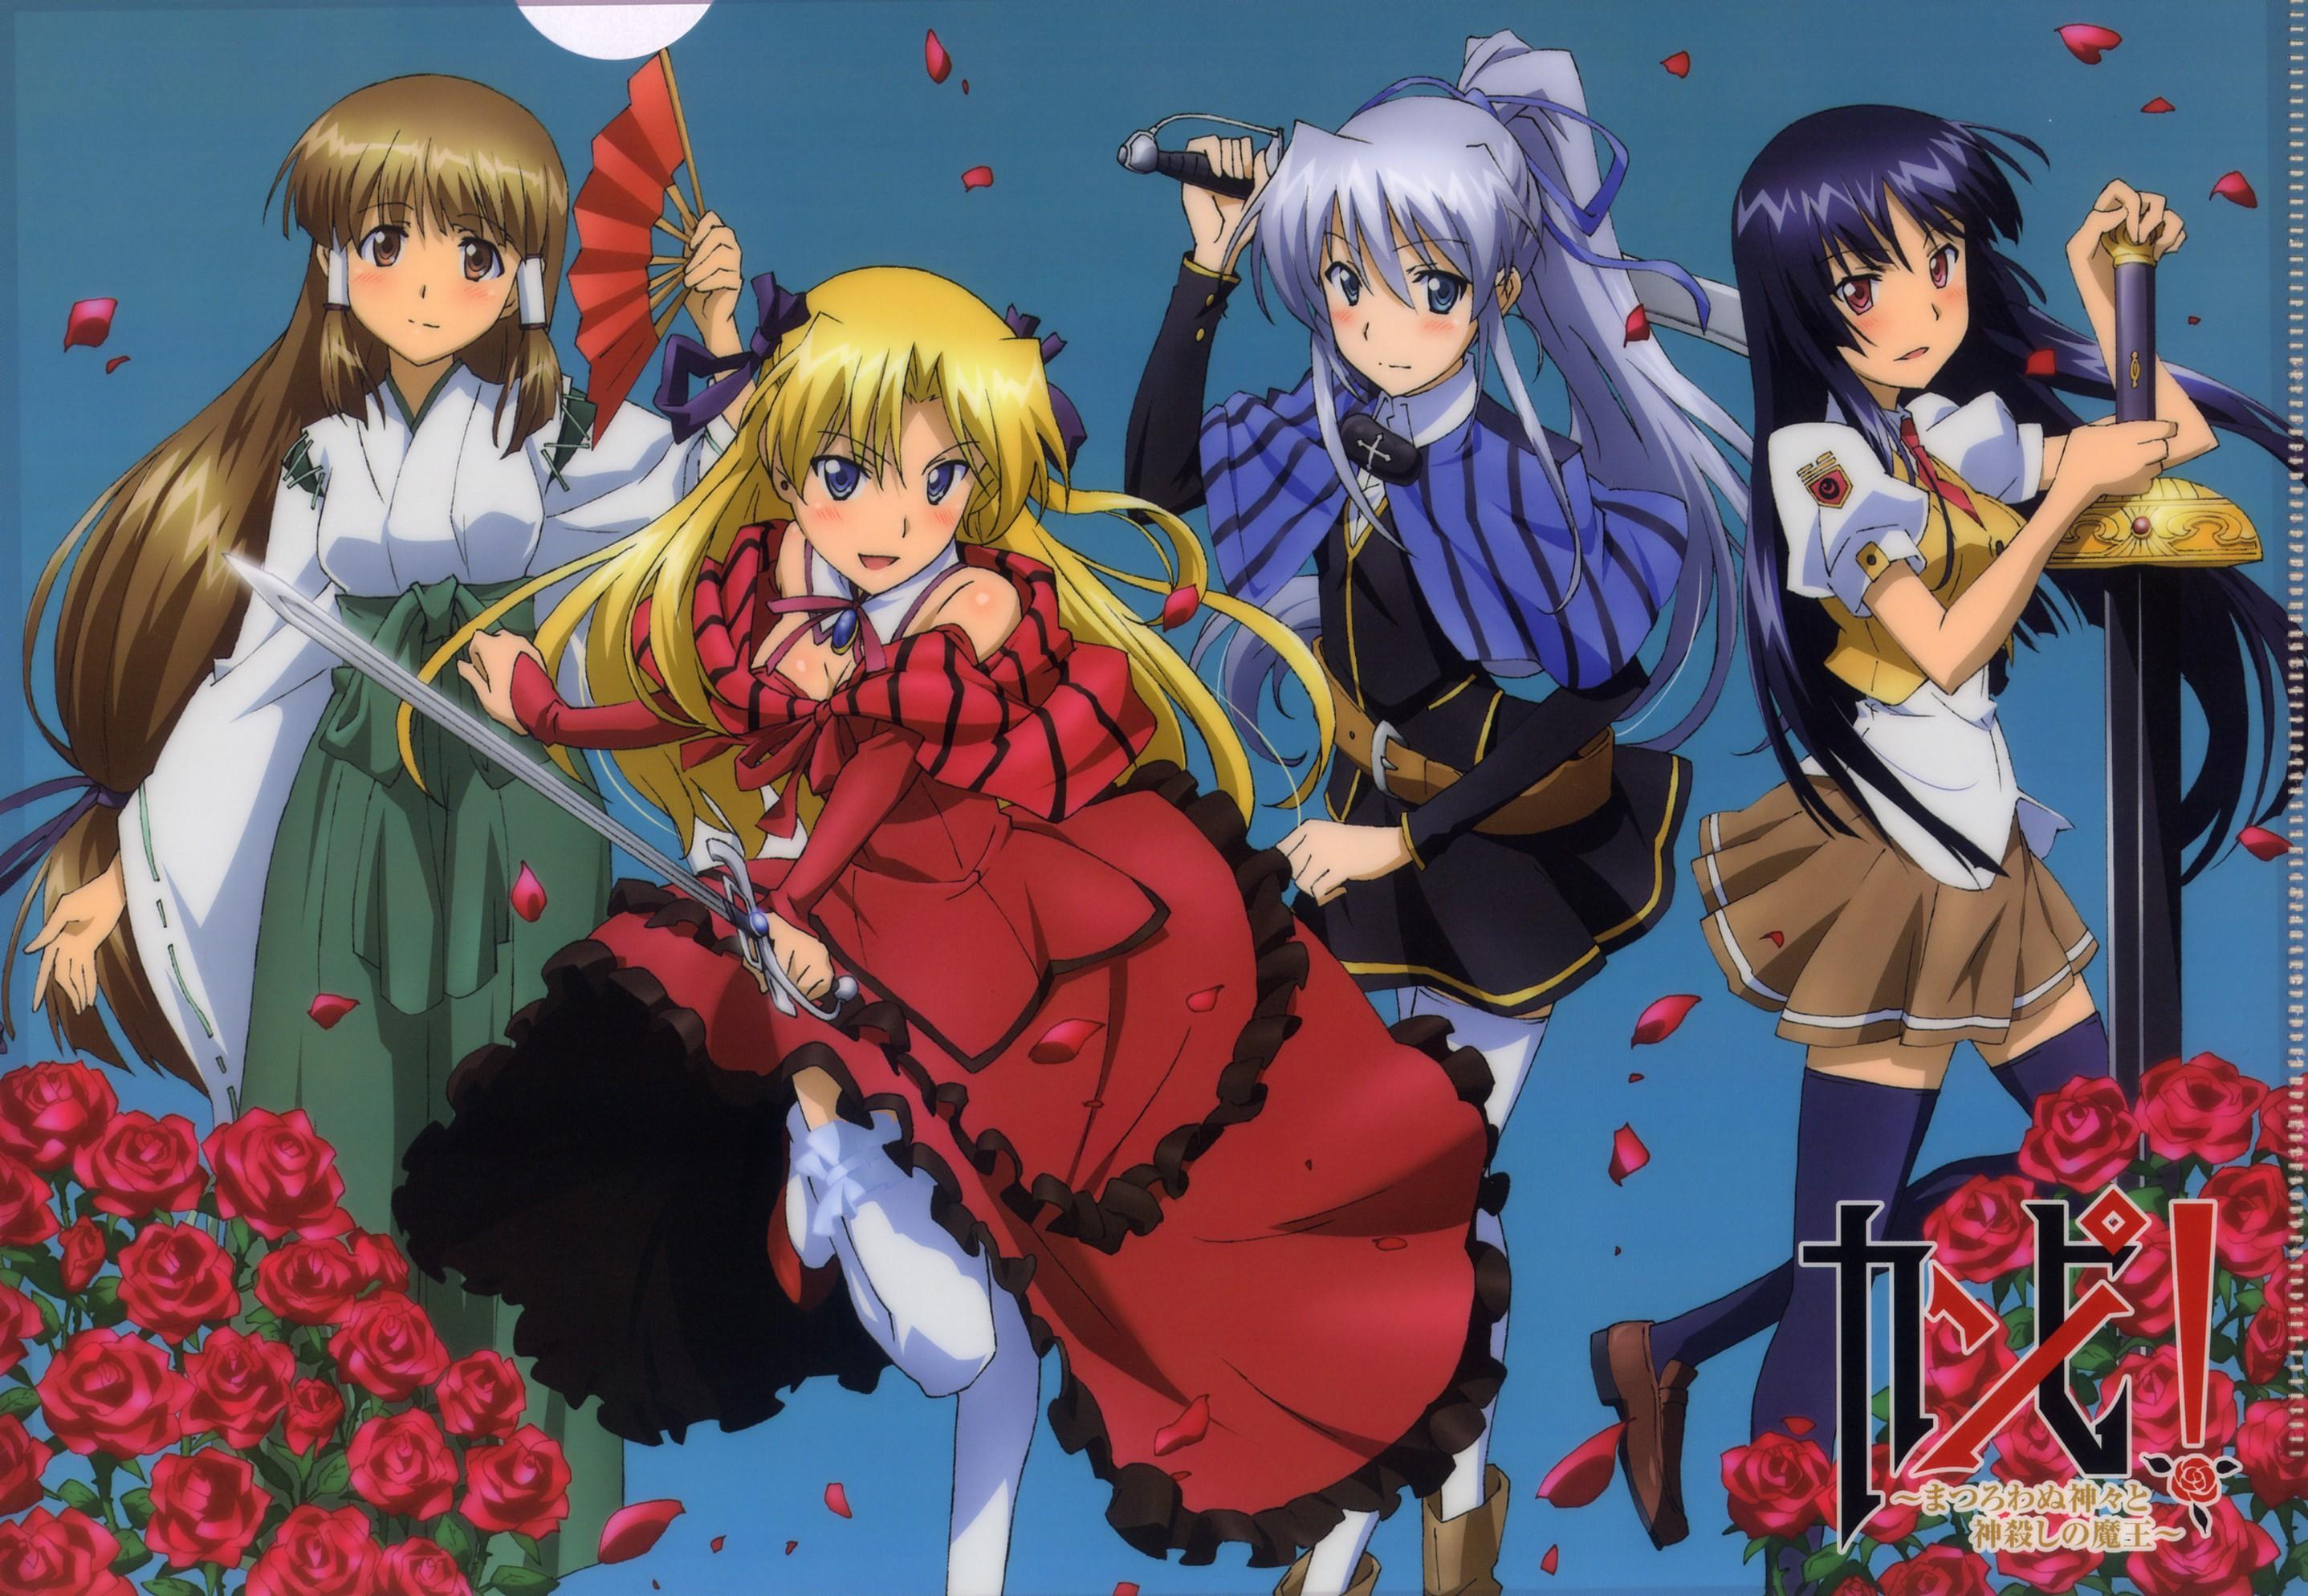 Illustration Anime Girls Campione Liliana Kranj Ar Erica Blandelli Comics Mariya Yuri Seish In Ena